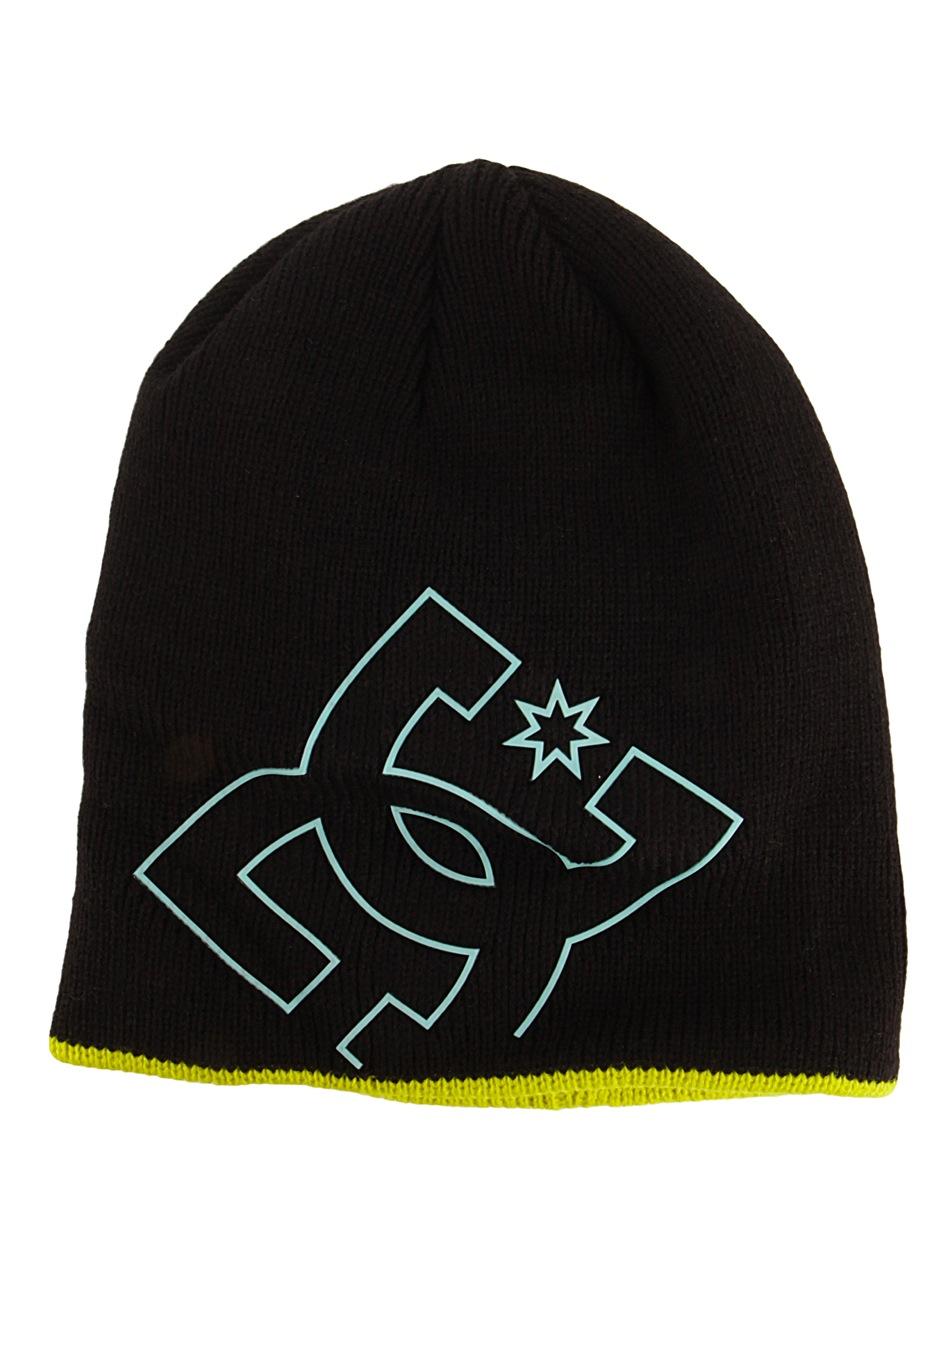 DC - Anthony 12 Black Tennis - Beanie - Streetwear Shop - Impericon.com UK 65f6def2705